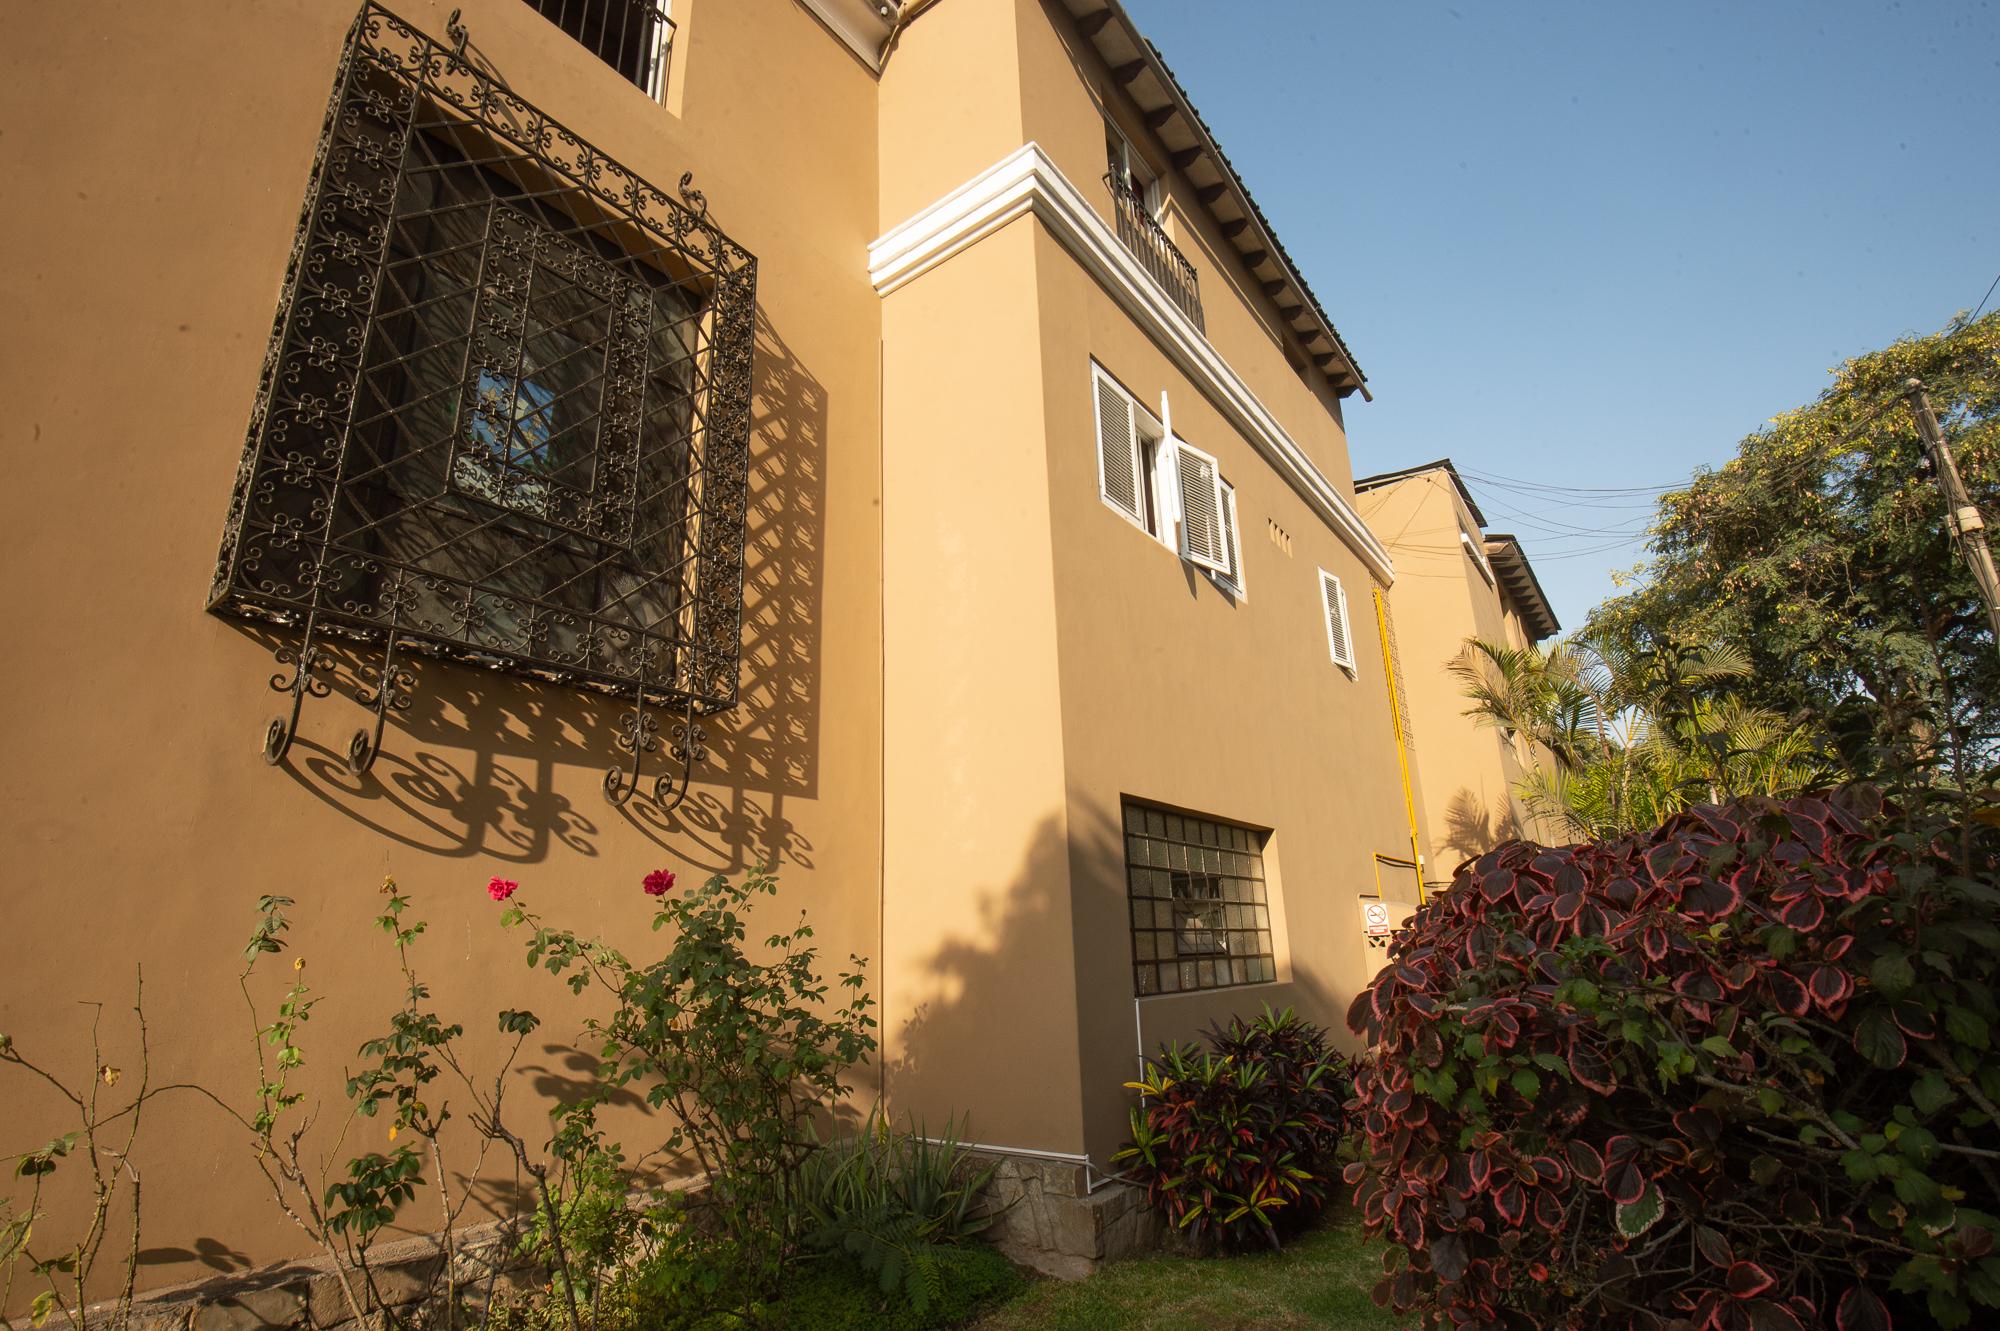 Hotel San Antonio Abad - External Garden II